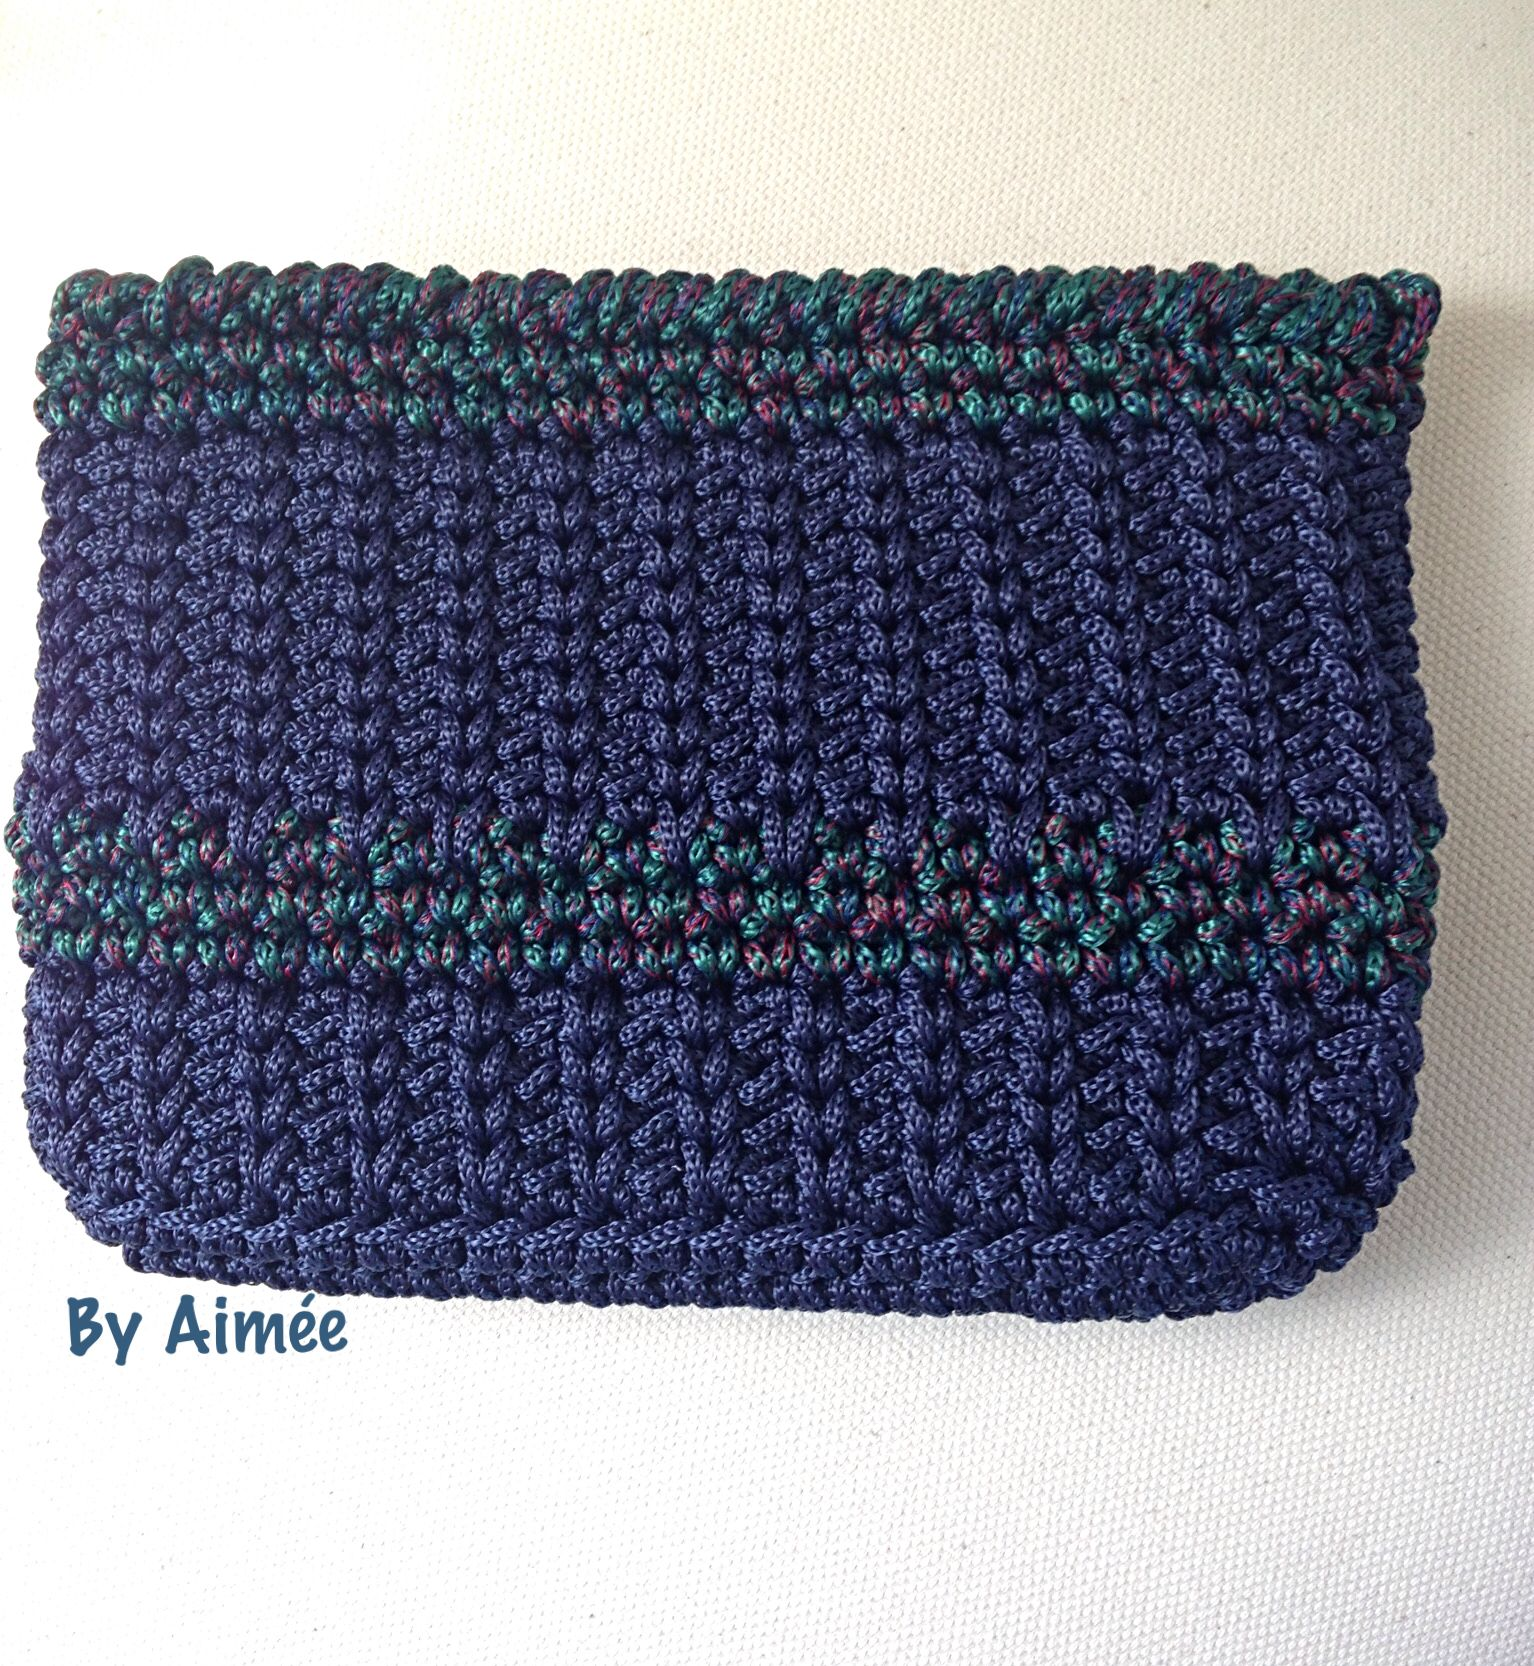 Crocheted Clutch bag